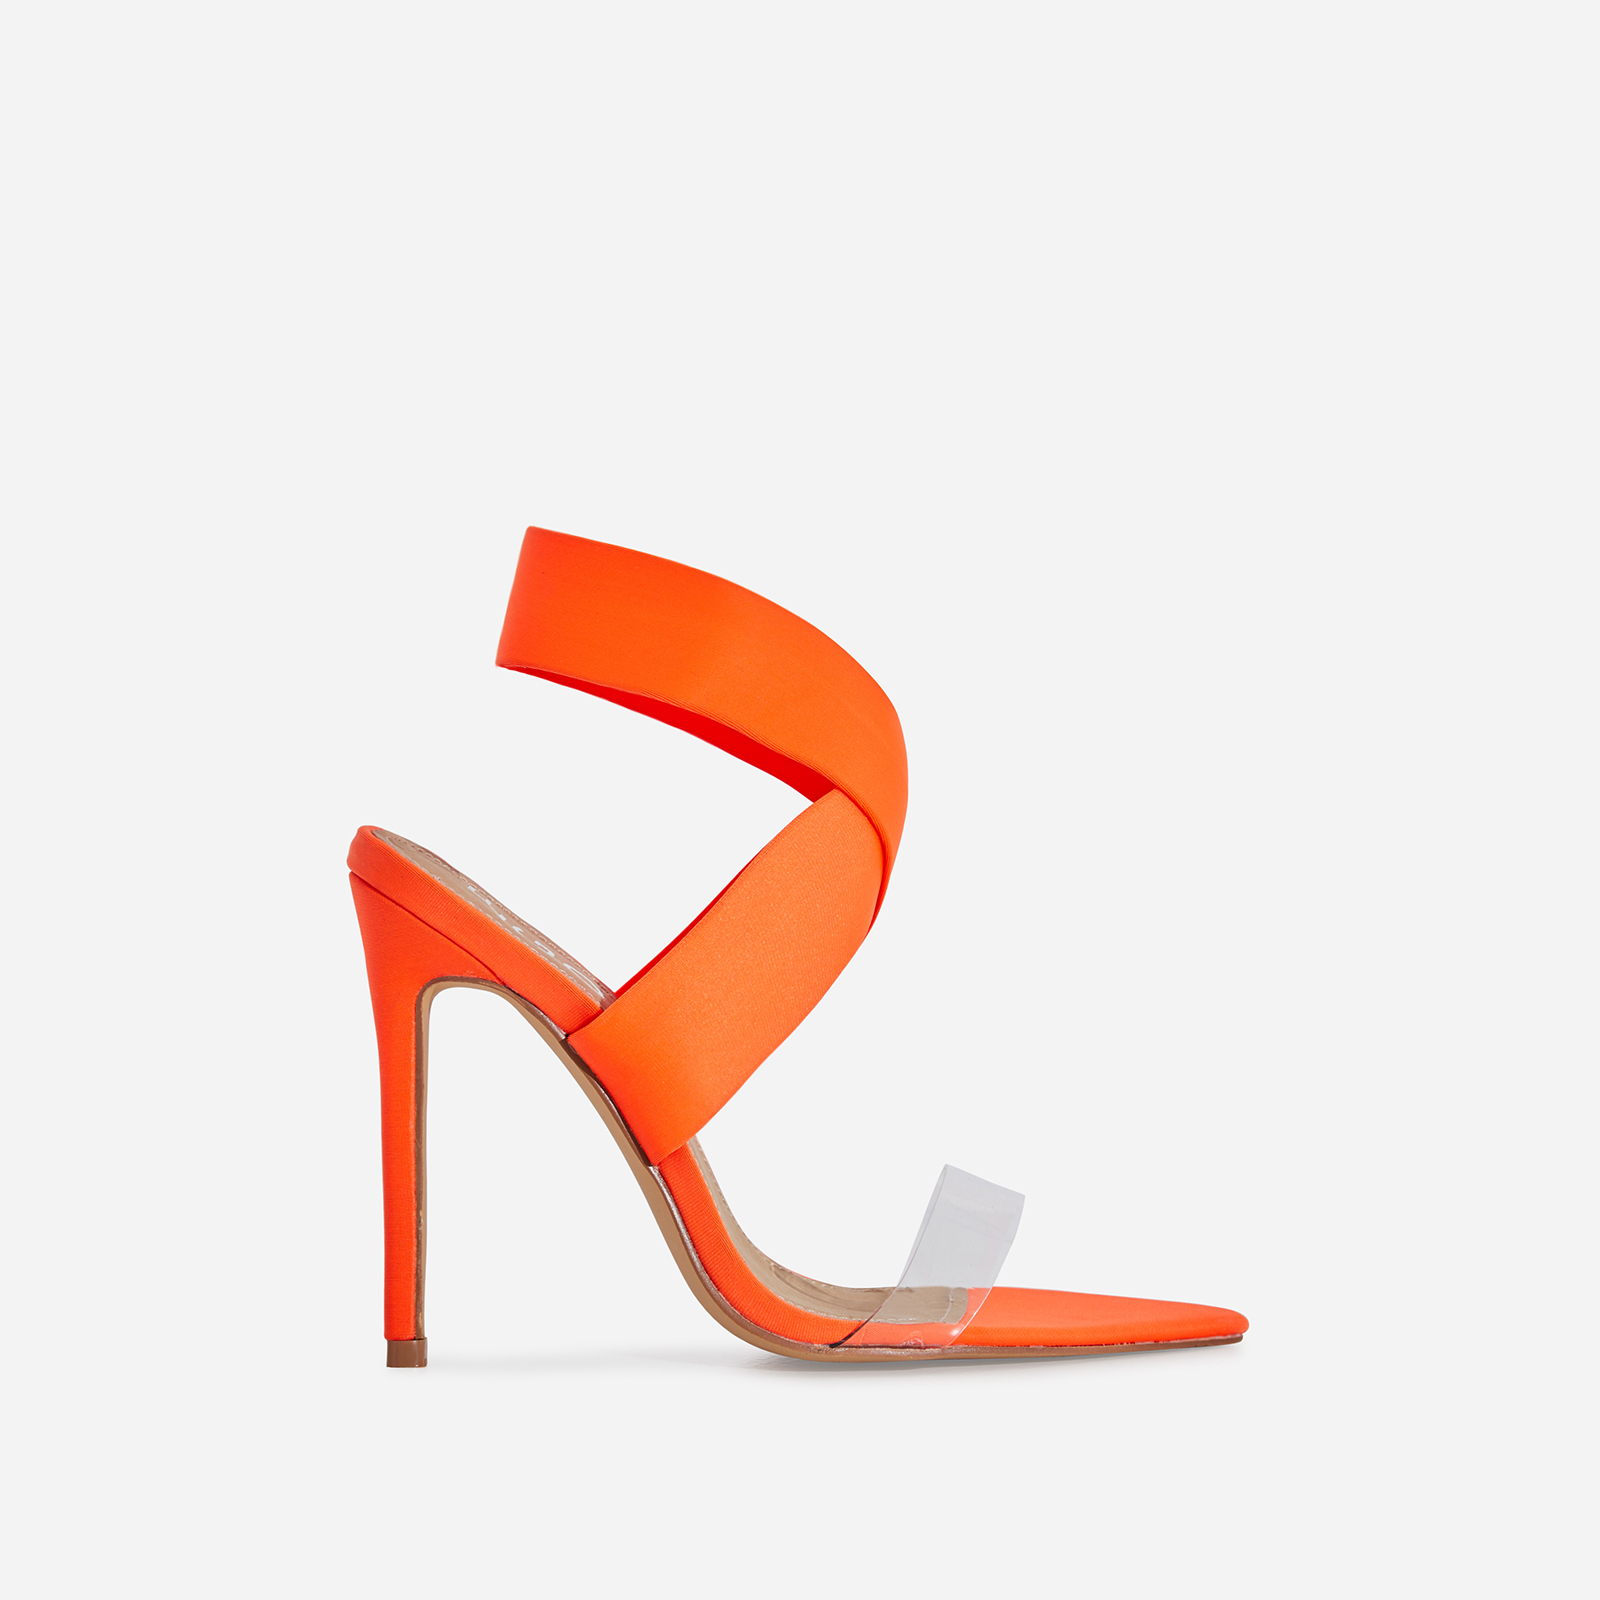 Joma Perspex Detail Heel In Neon Orange Lycra